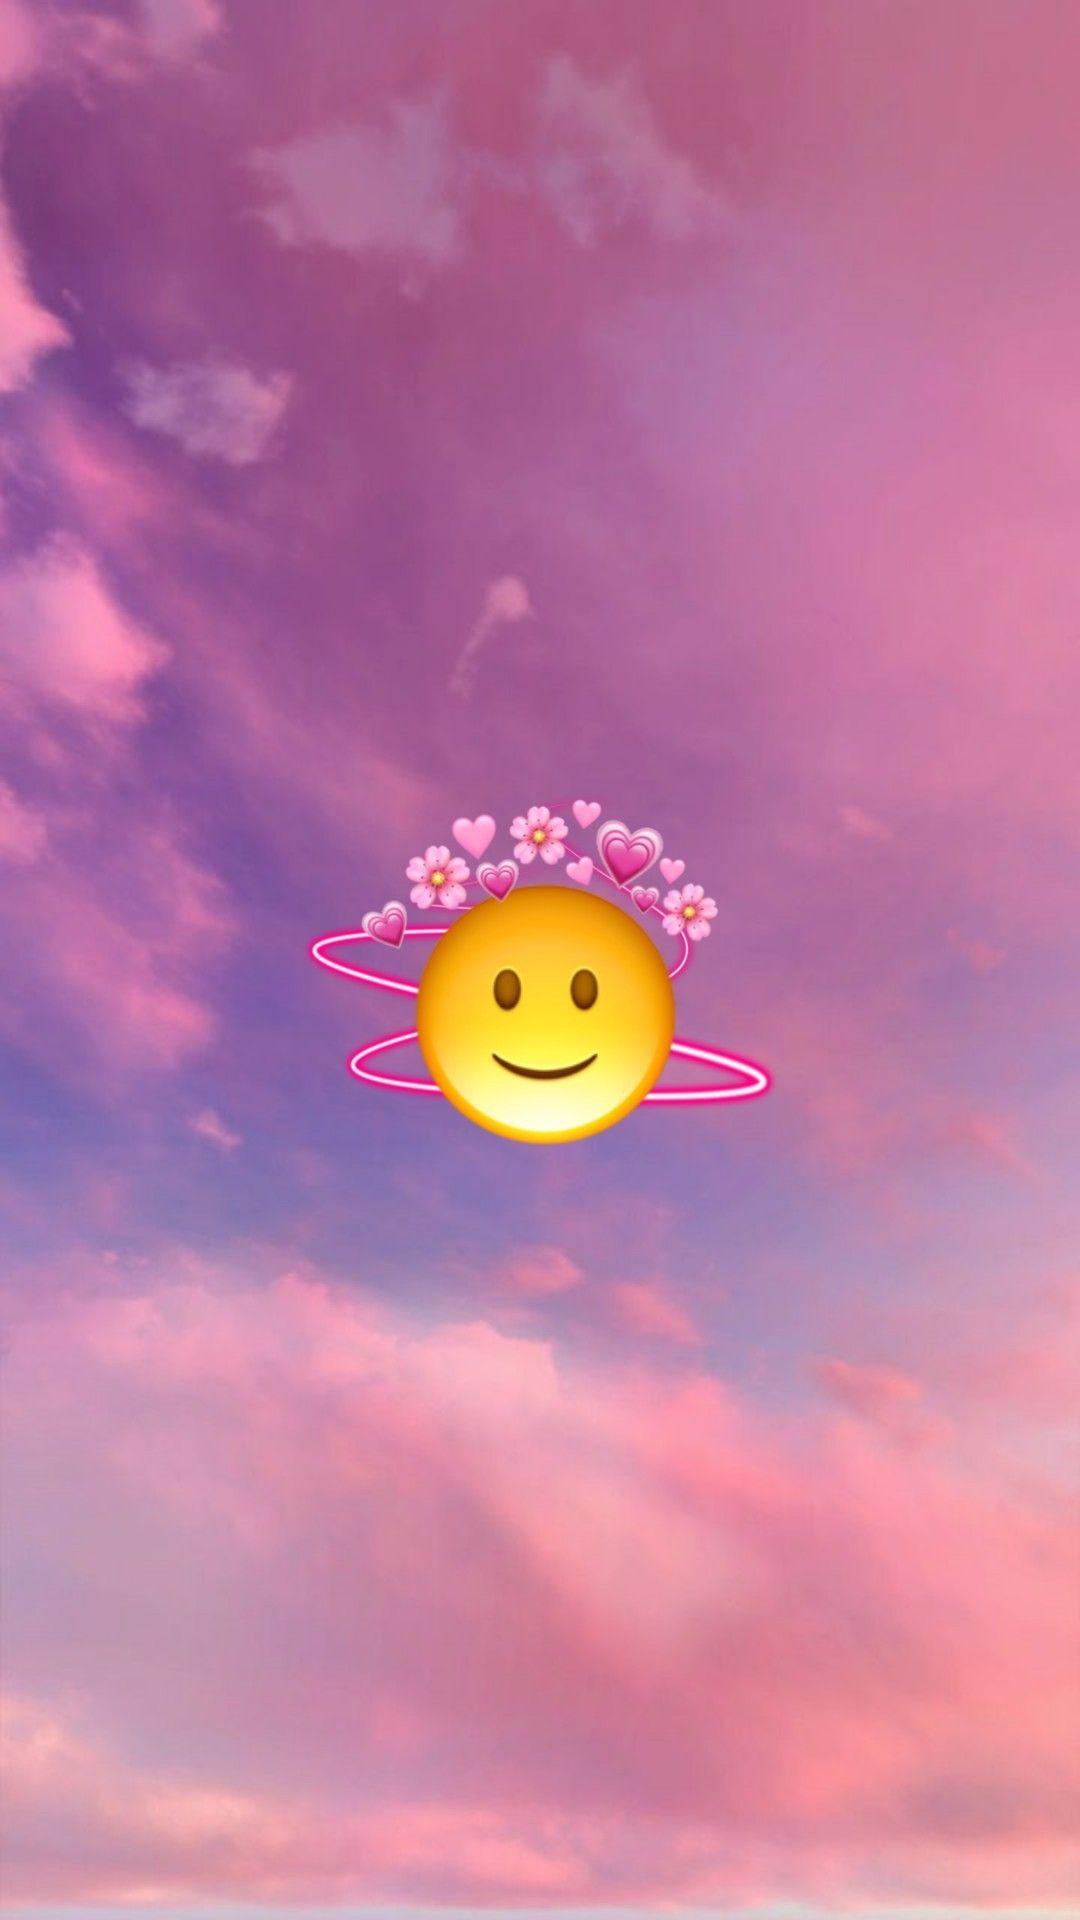 🙂🌸💗   Emoji wallpaper iphone, Emoji wallpaper, Wallpaper iphone ...